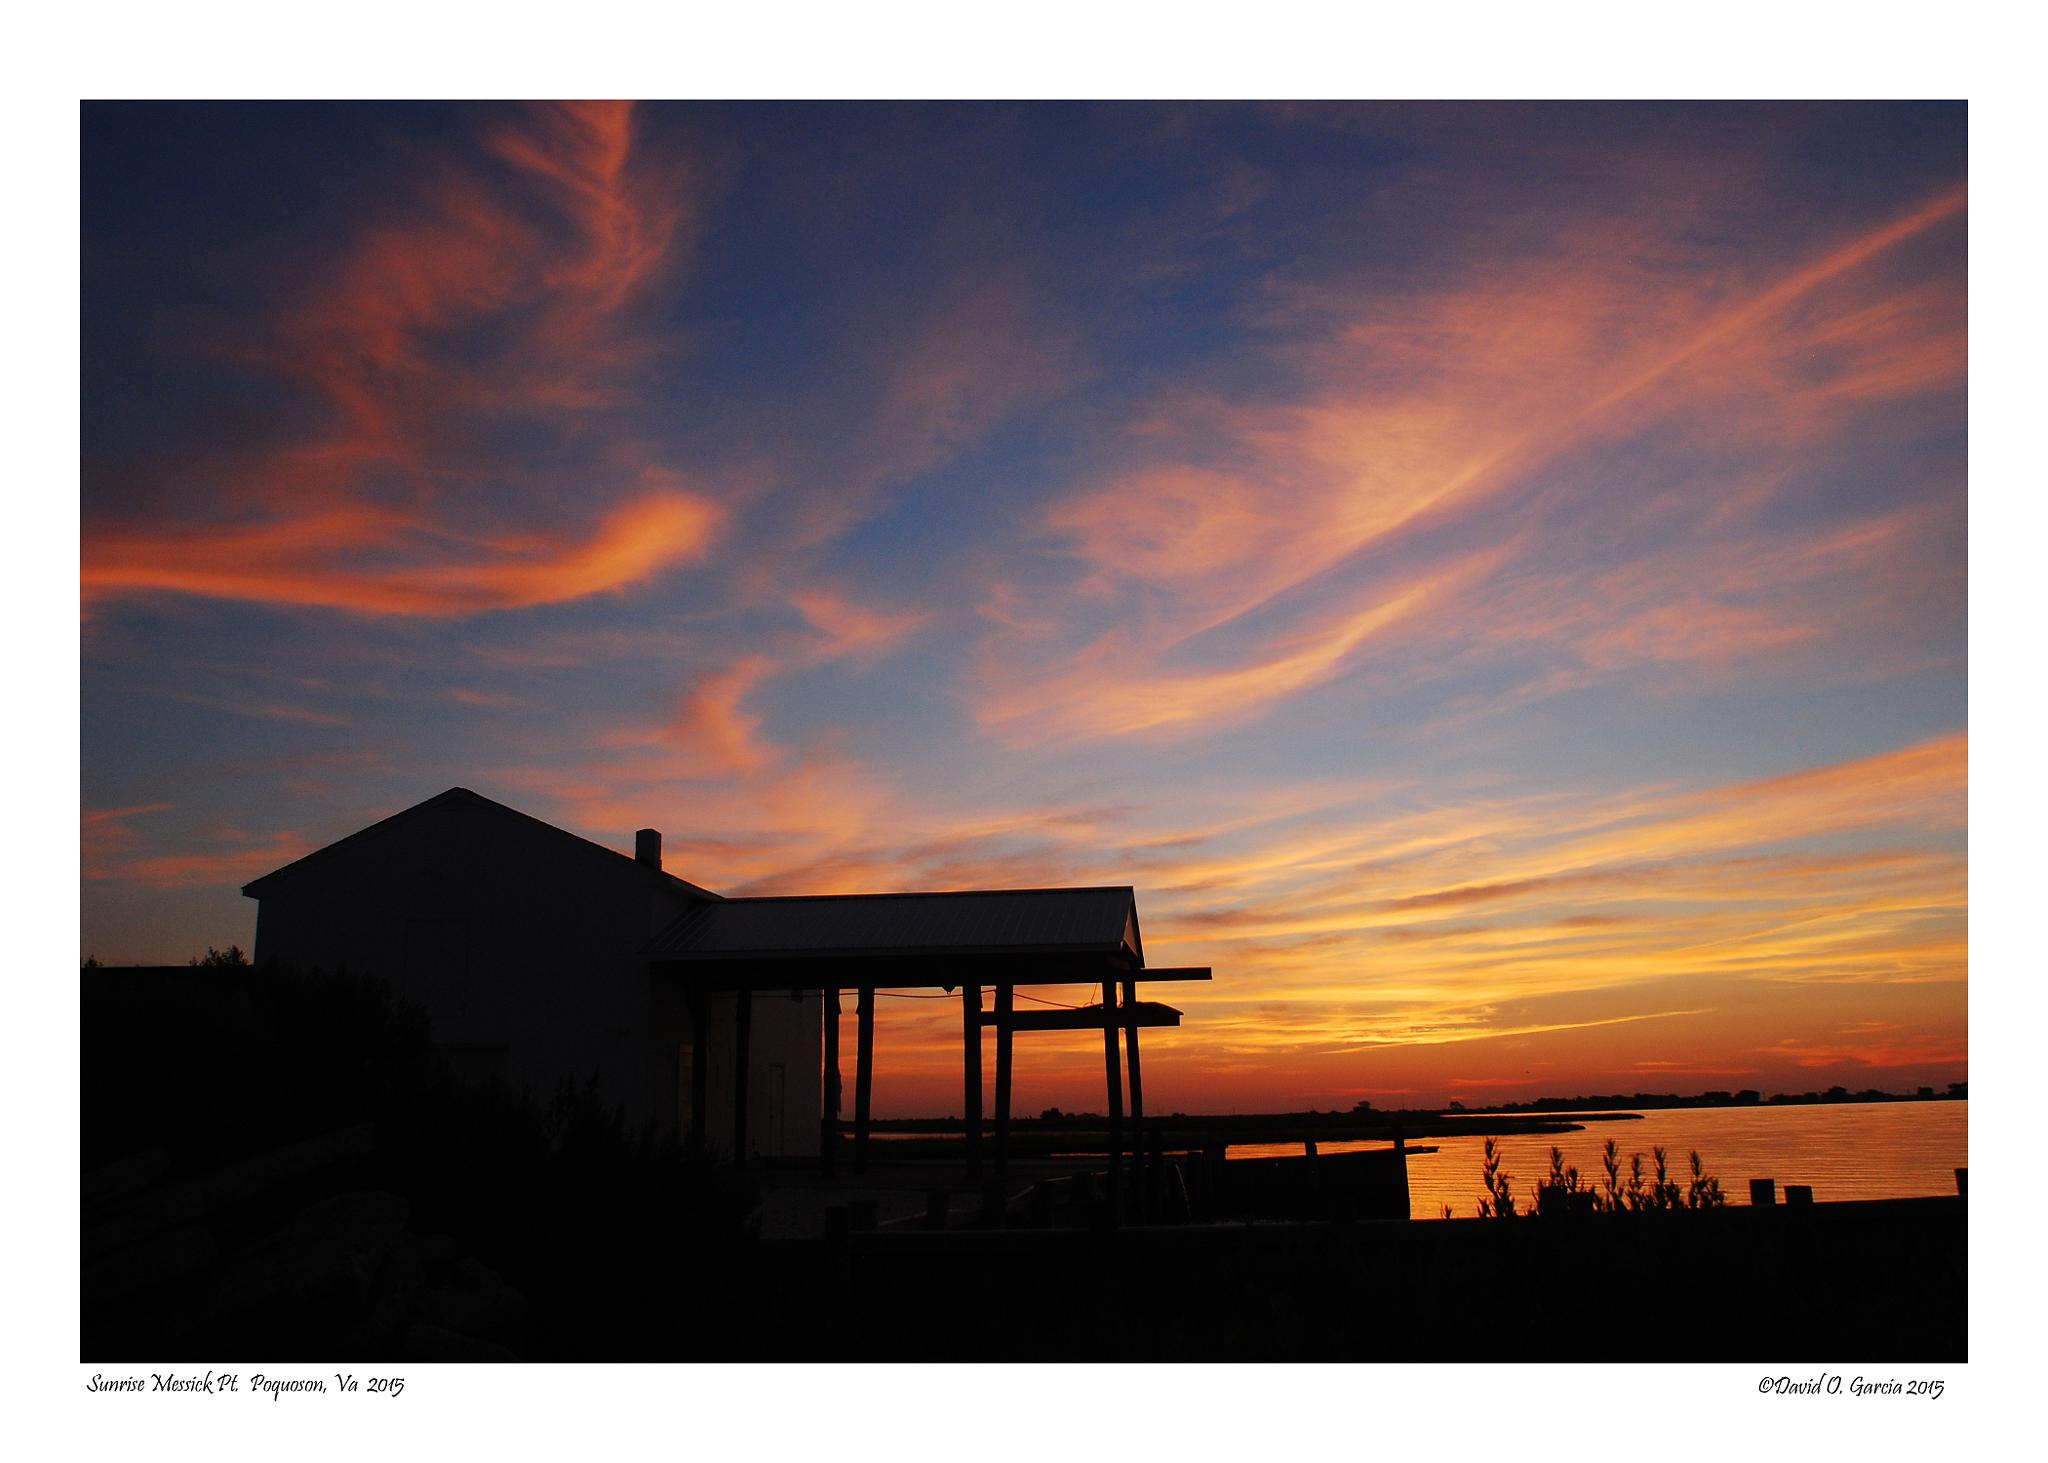 Sunrise Messick Point Poquson, VA by David Garcia